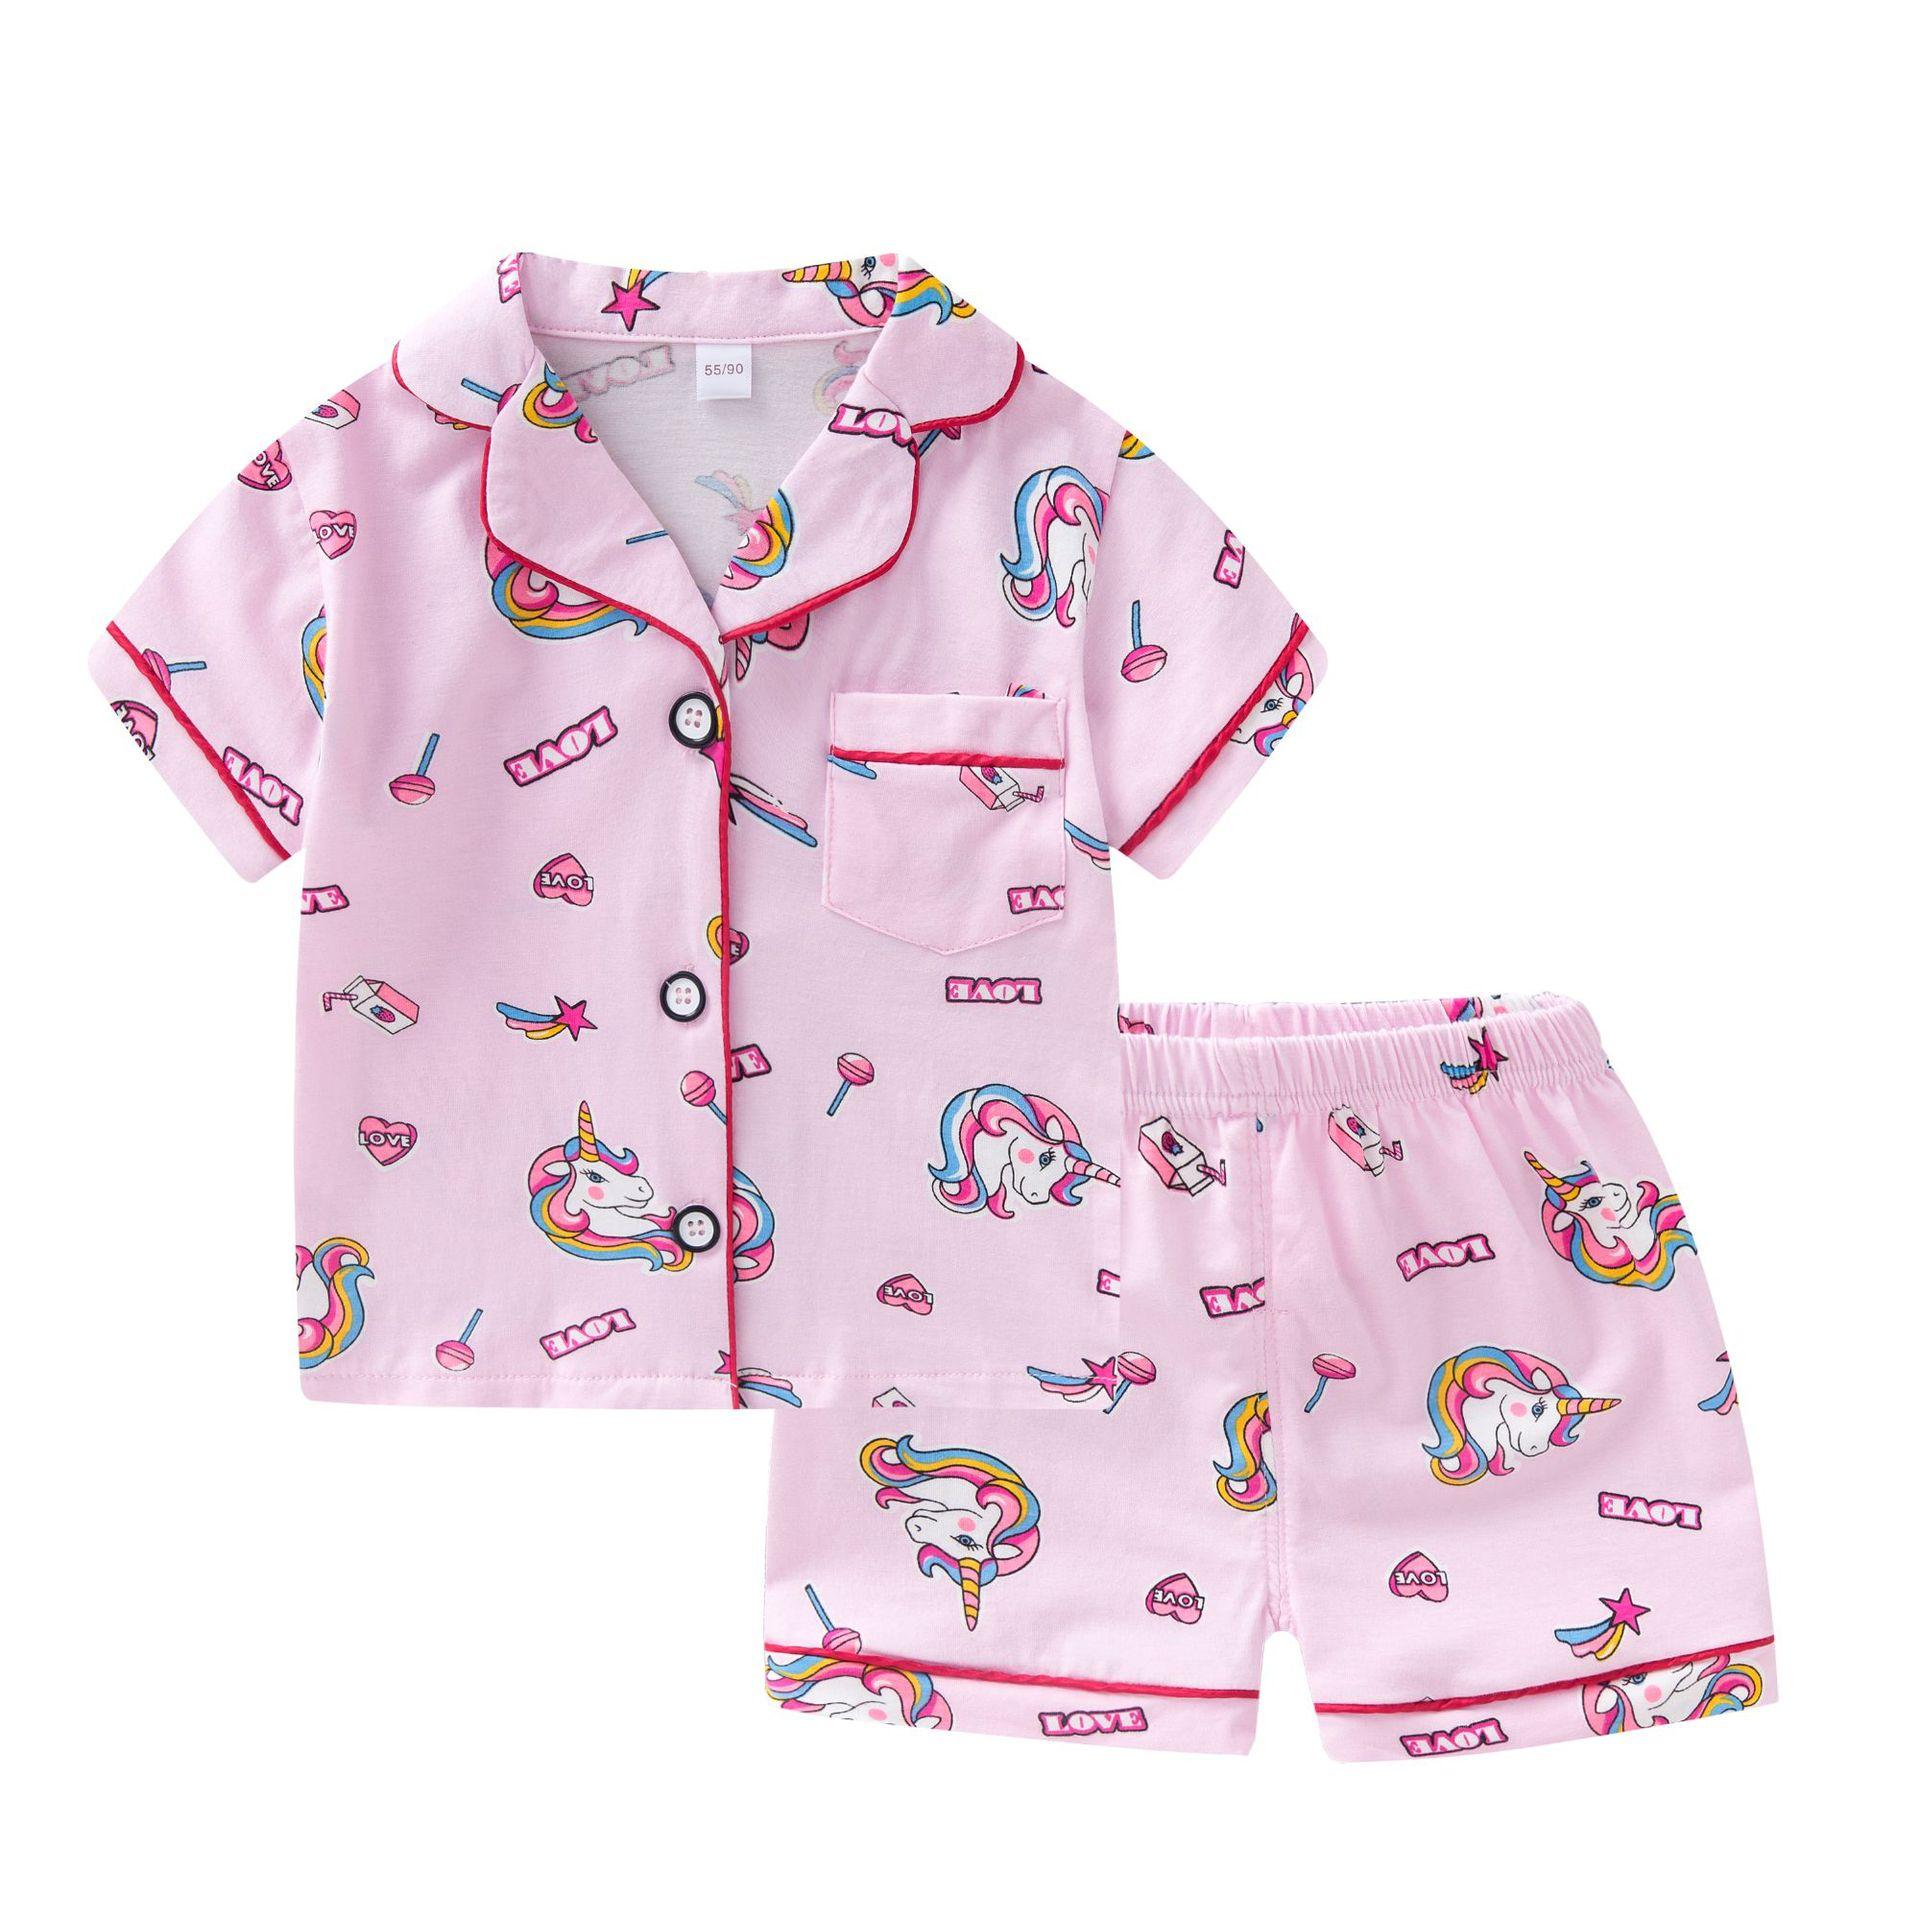 SAILEROAD 2021 New Cute Unicorn Pajamas For Girls Cartoon Animals Pyjamas For Kids Pijama Infantil Boys Sleepwear Clothes Sets 1